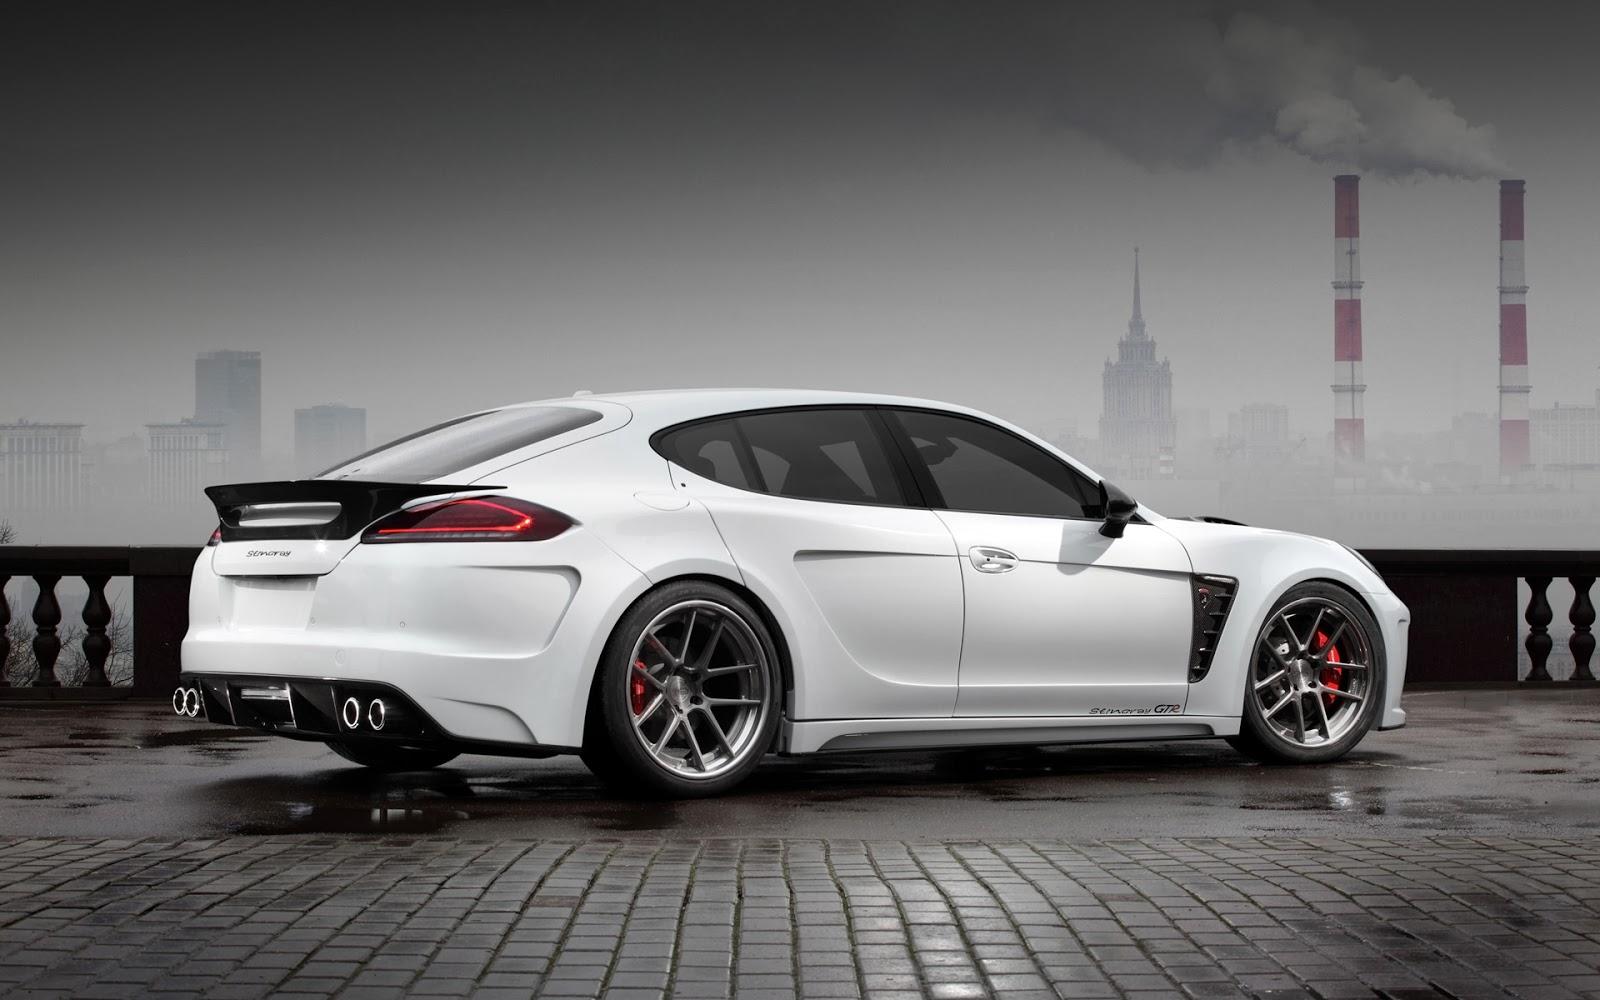 Porsche Panamera Best Luxury Cars: 2014 TopCar Porsche Panamera Stingray GTR - Review